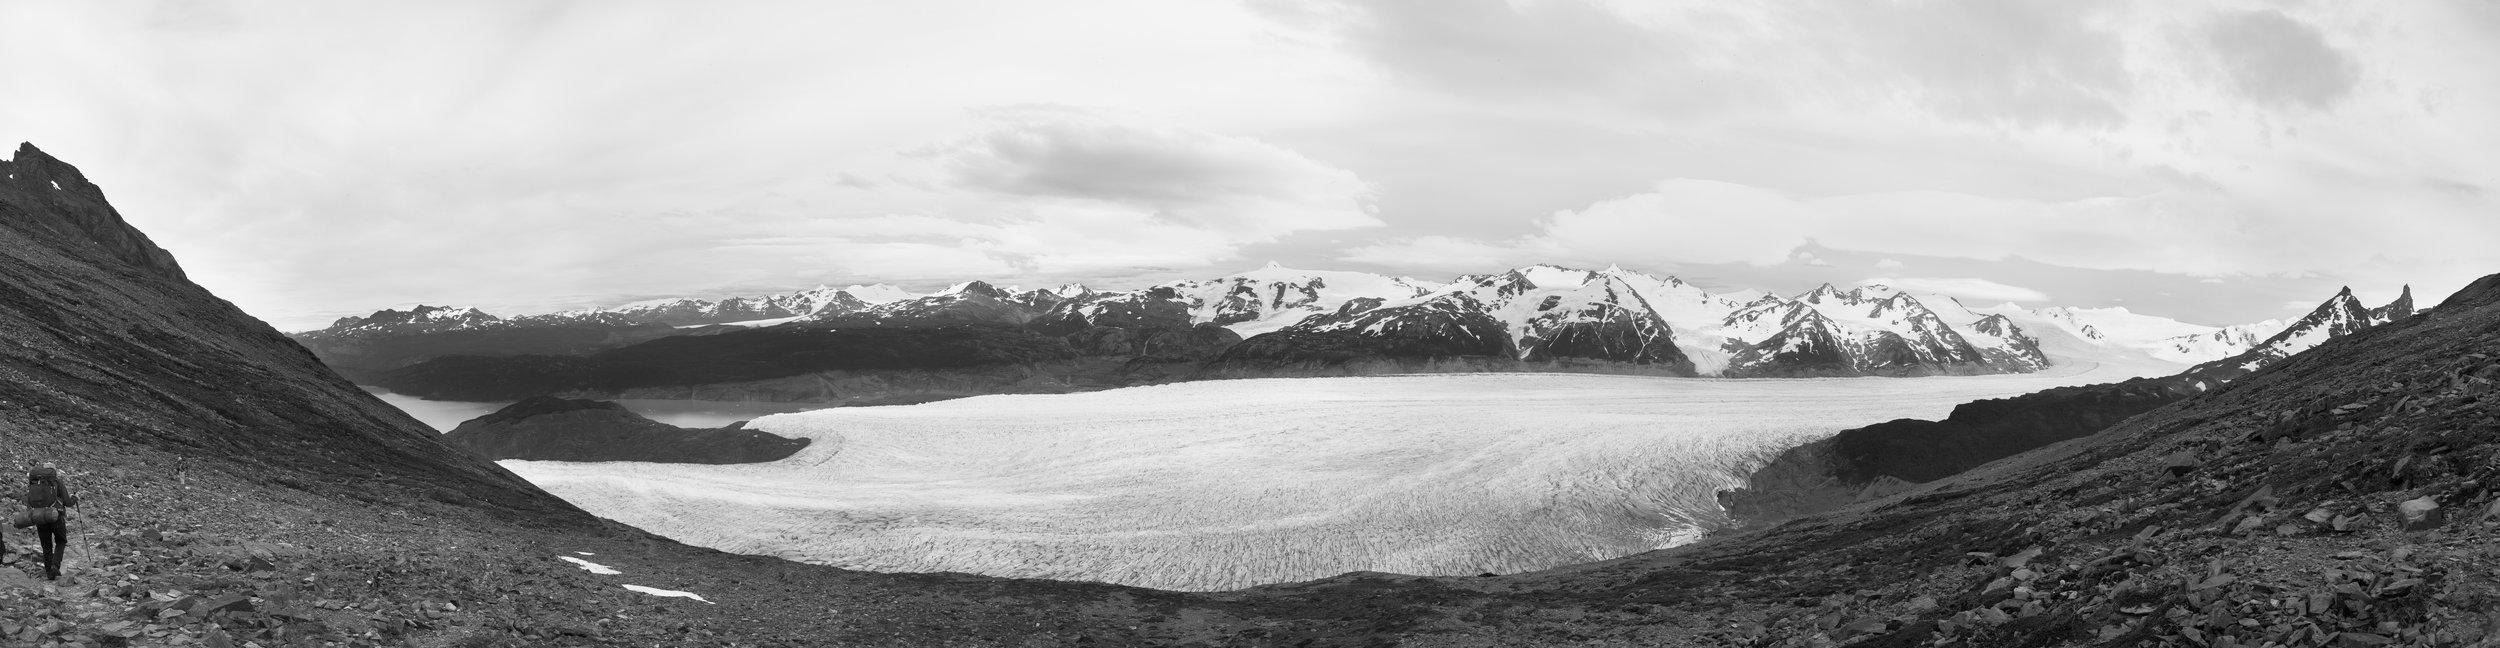 Grey Glacier.Torres del Paine National Park, Chile.